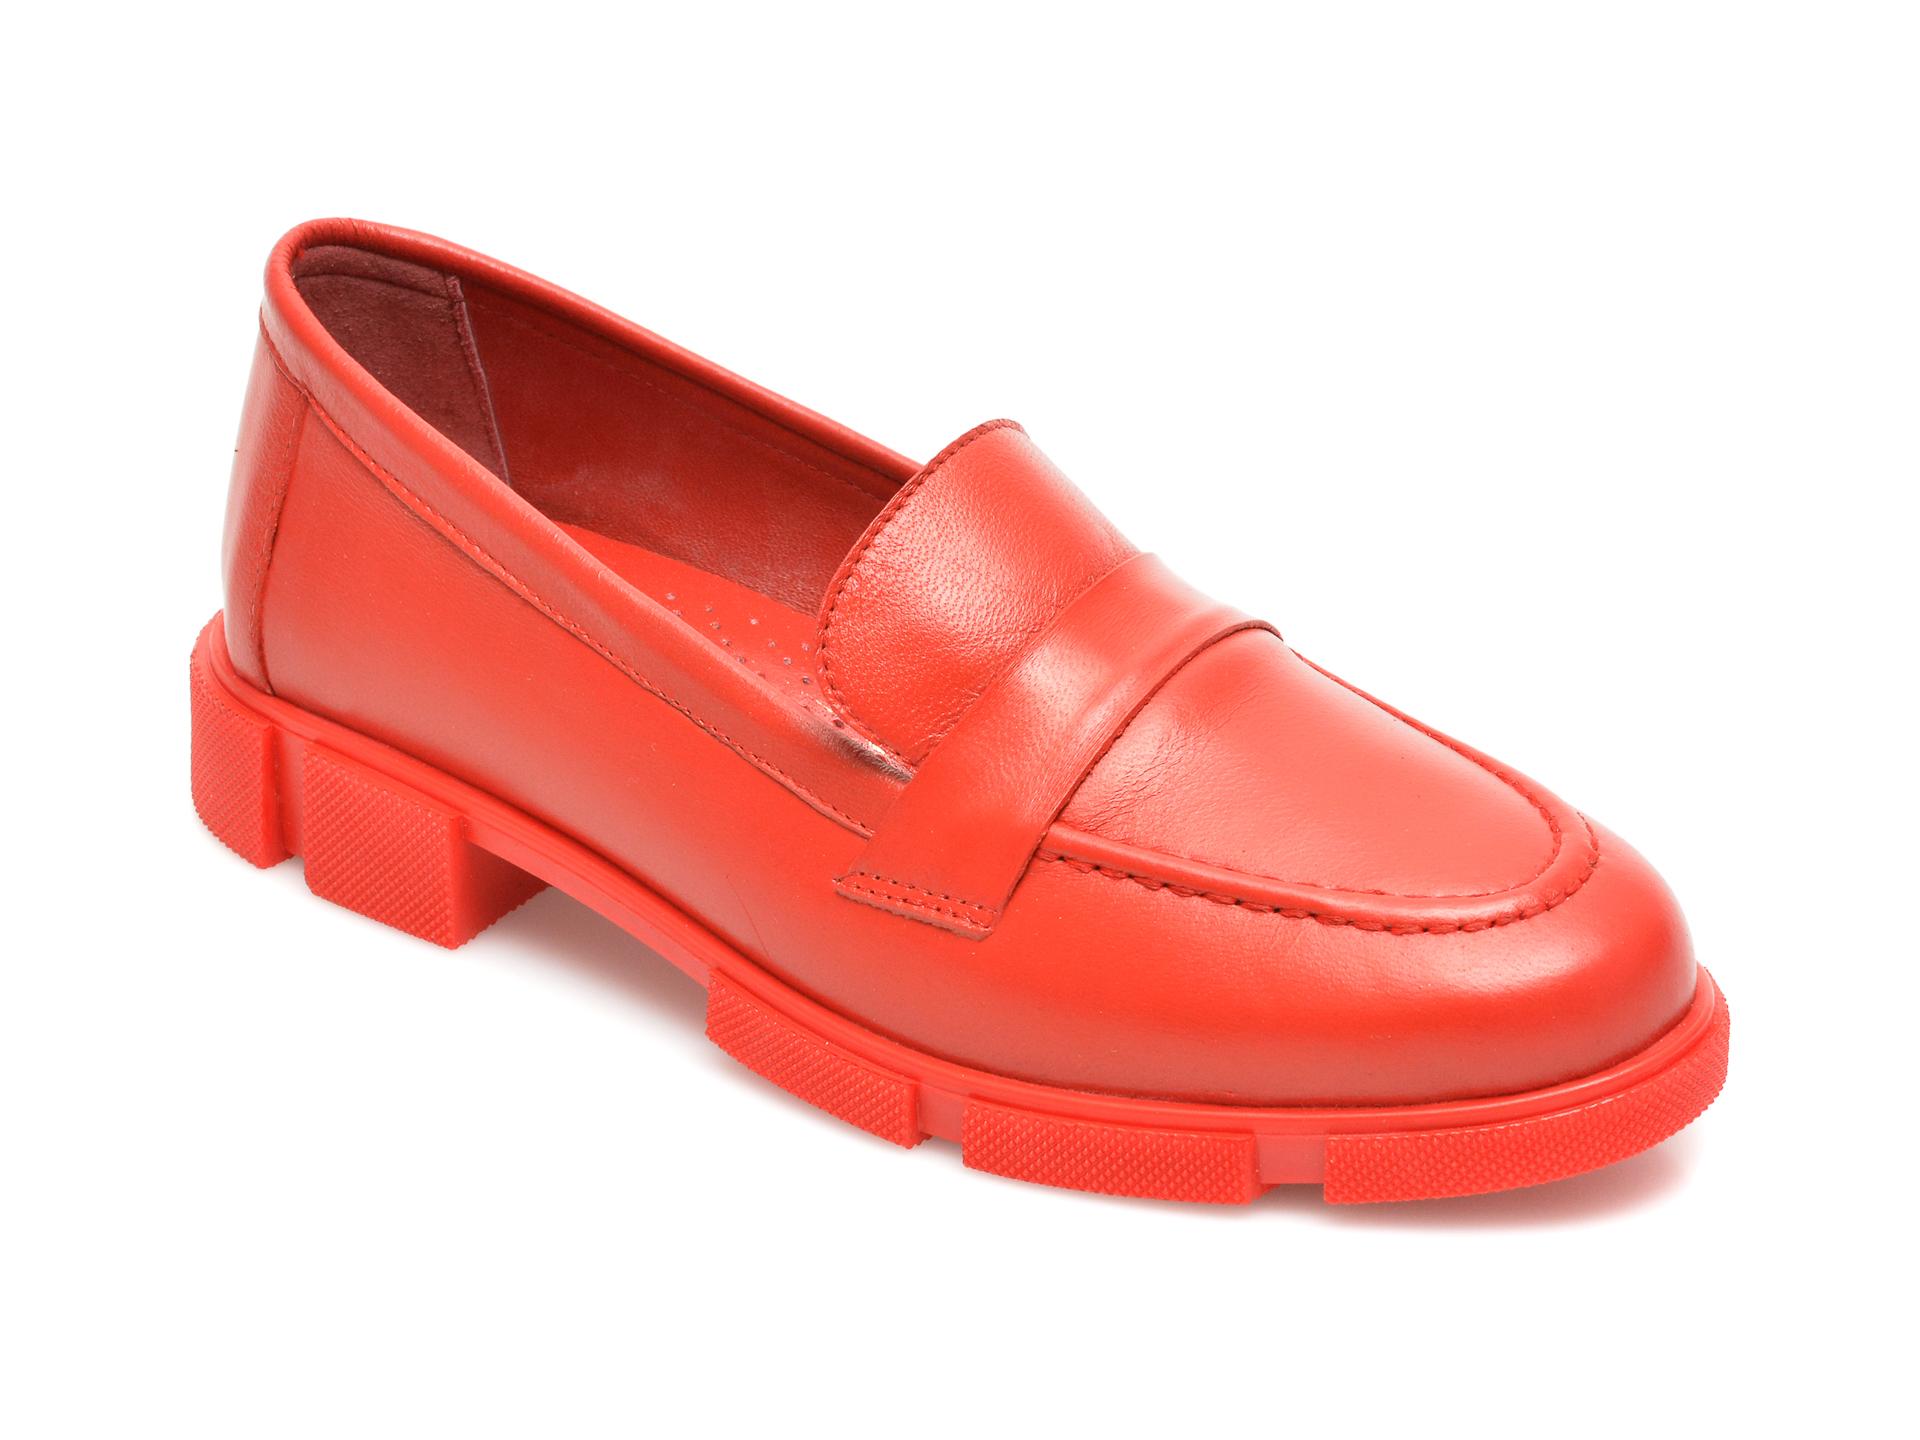 Pantofi MOLLY BESSA rosii, MN122, din piele naturala